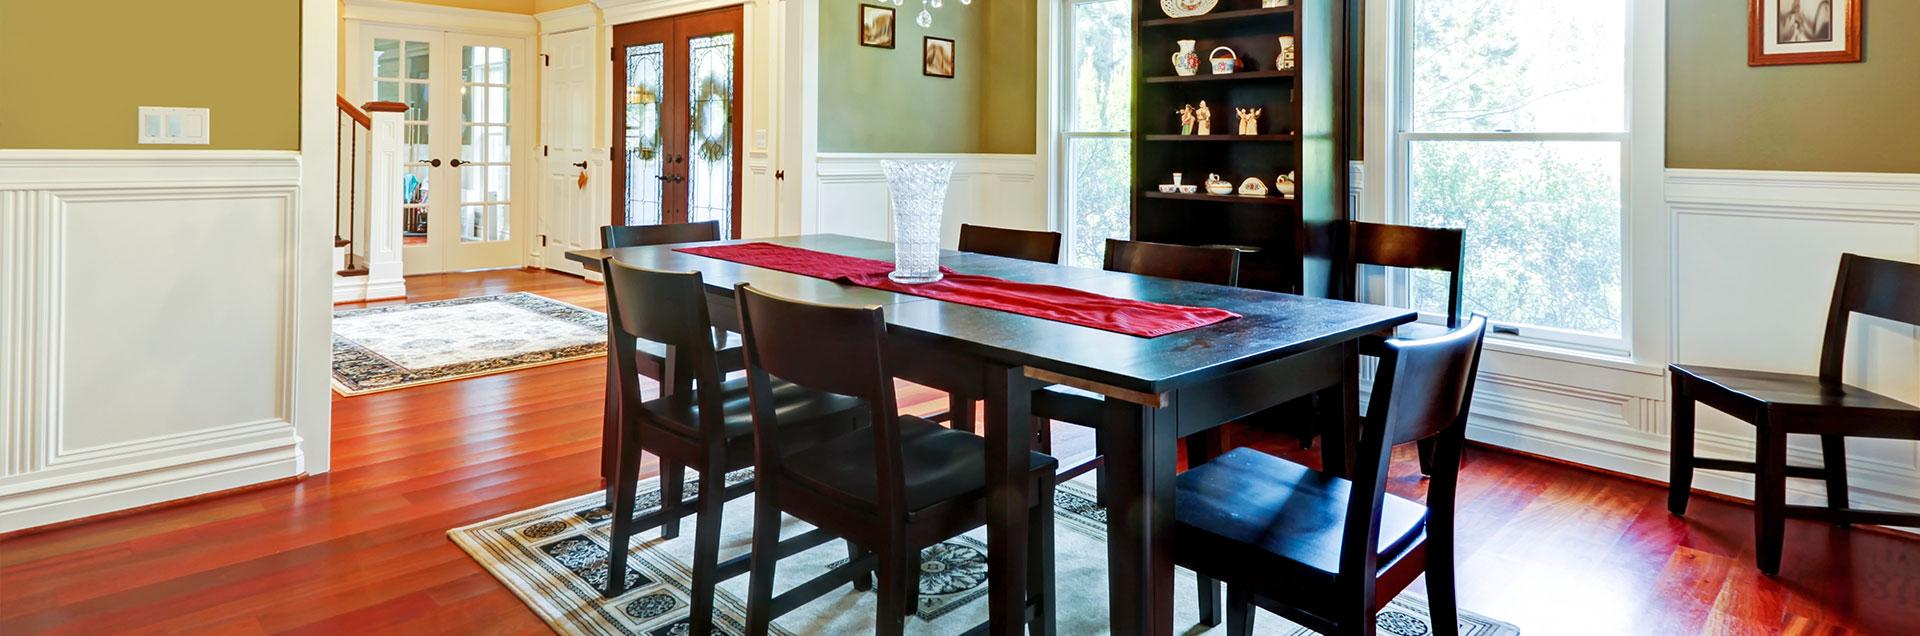 Top hardwood flooring company in Arlington Heights, Illinois